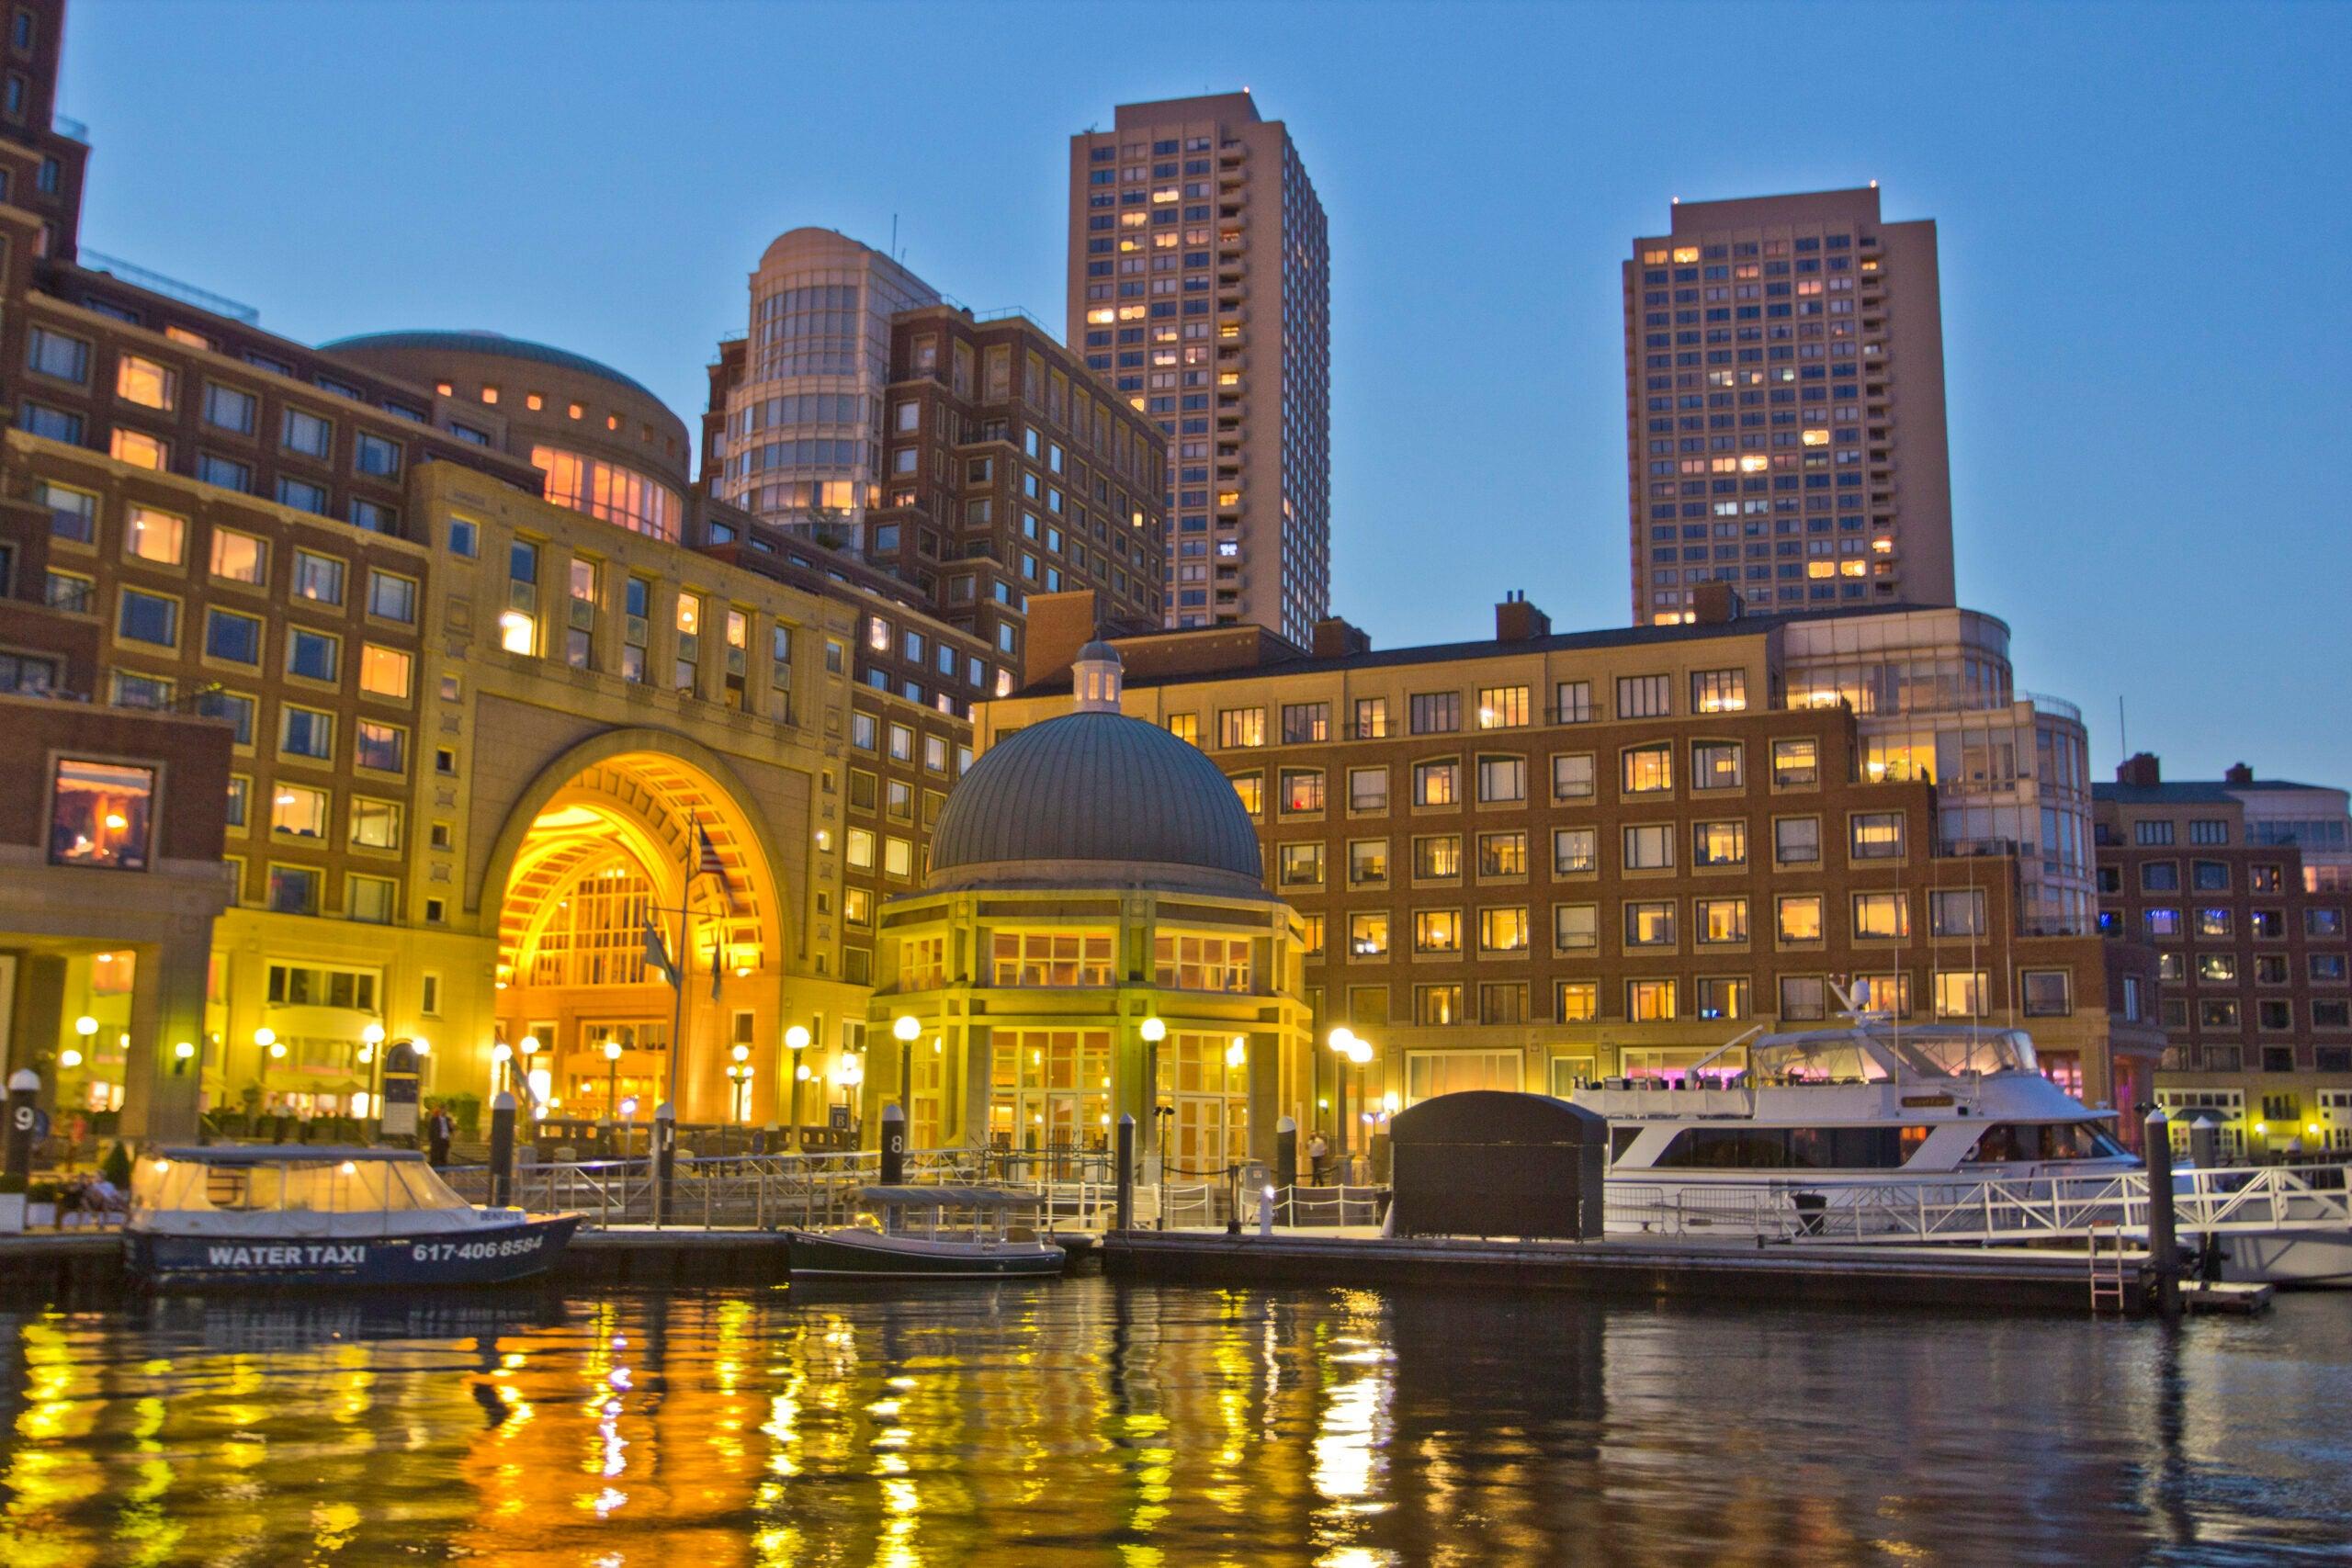 The Boston Harbor Hotel